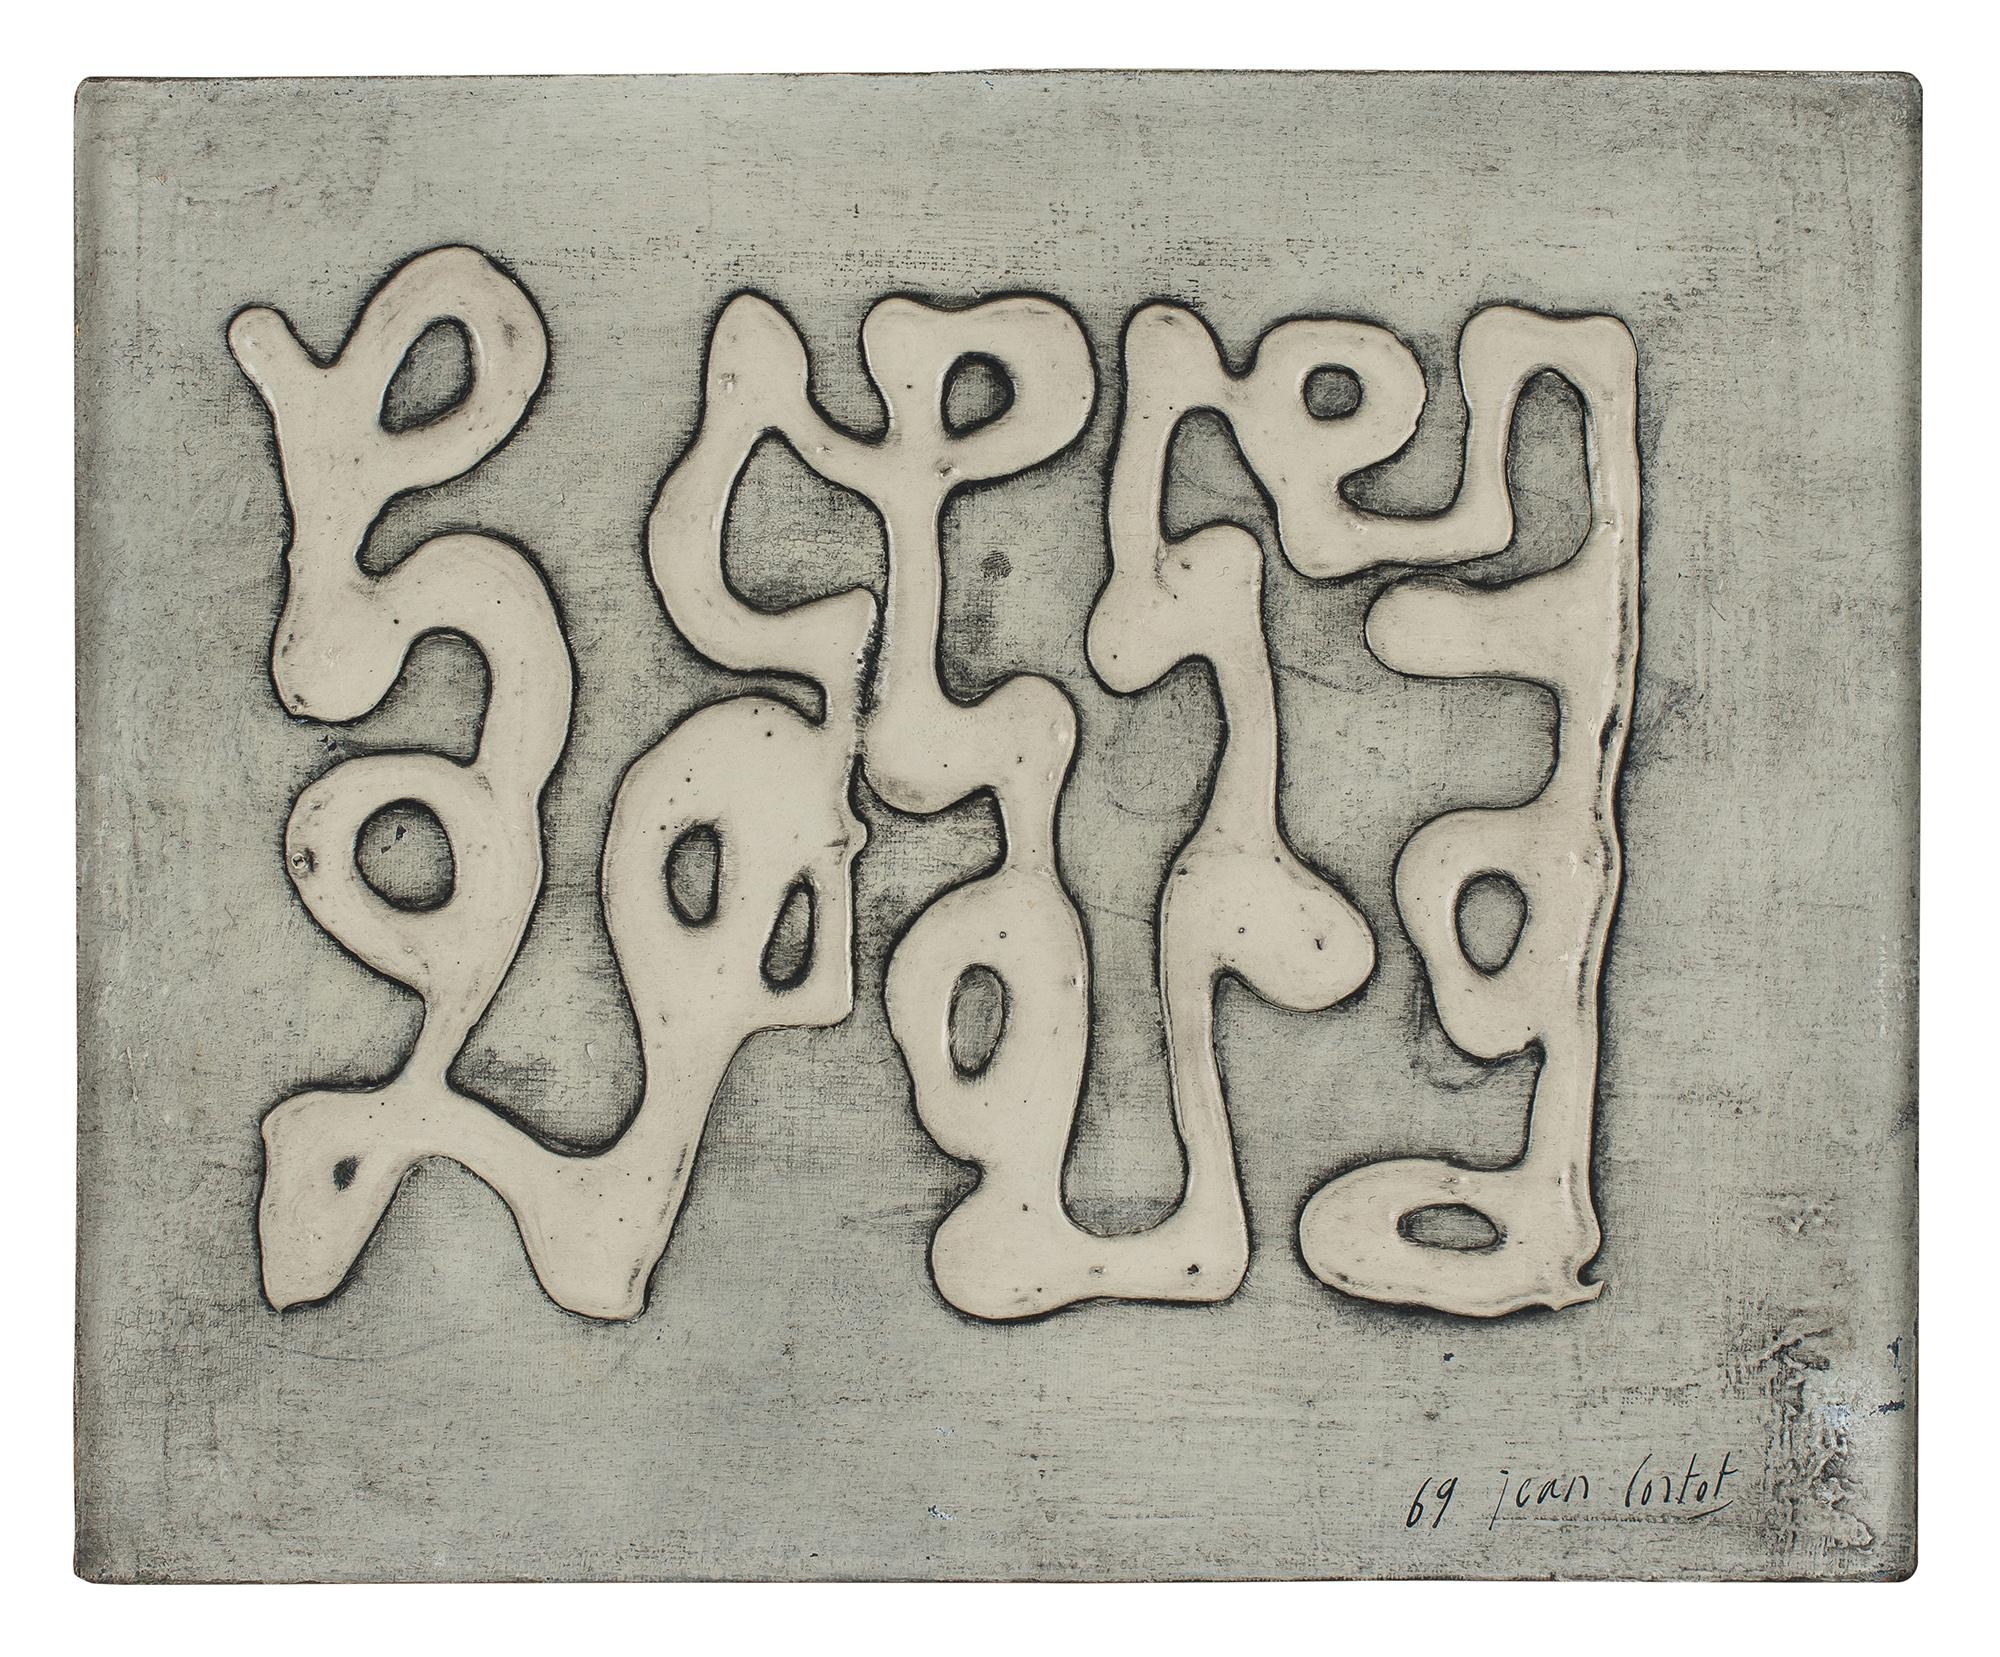 jean cortot - canvas ecriture 1969